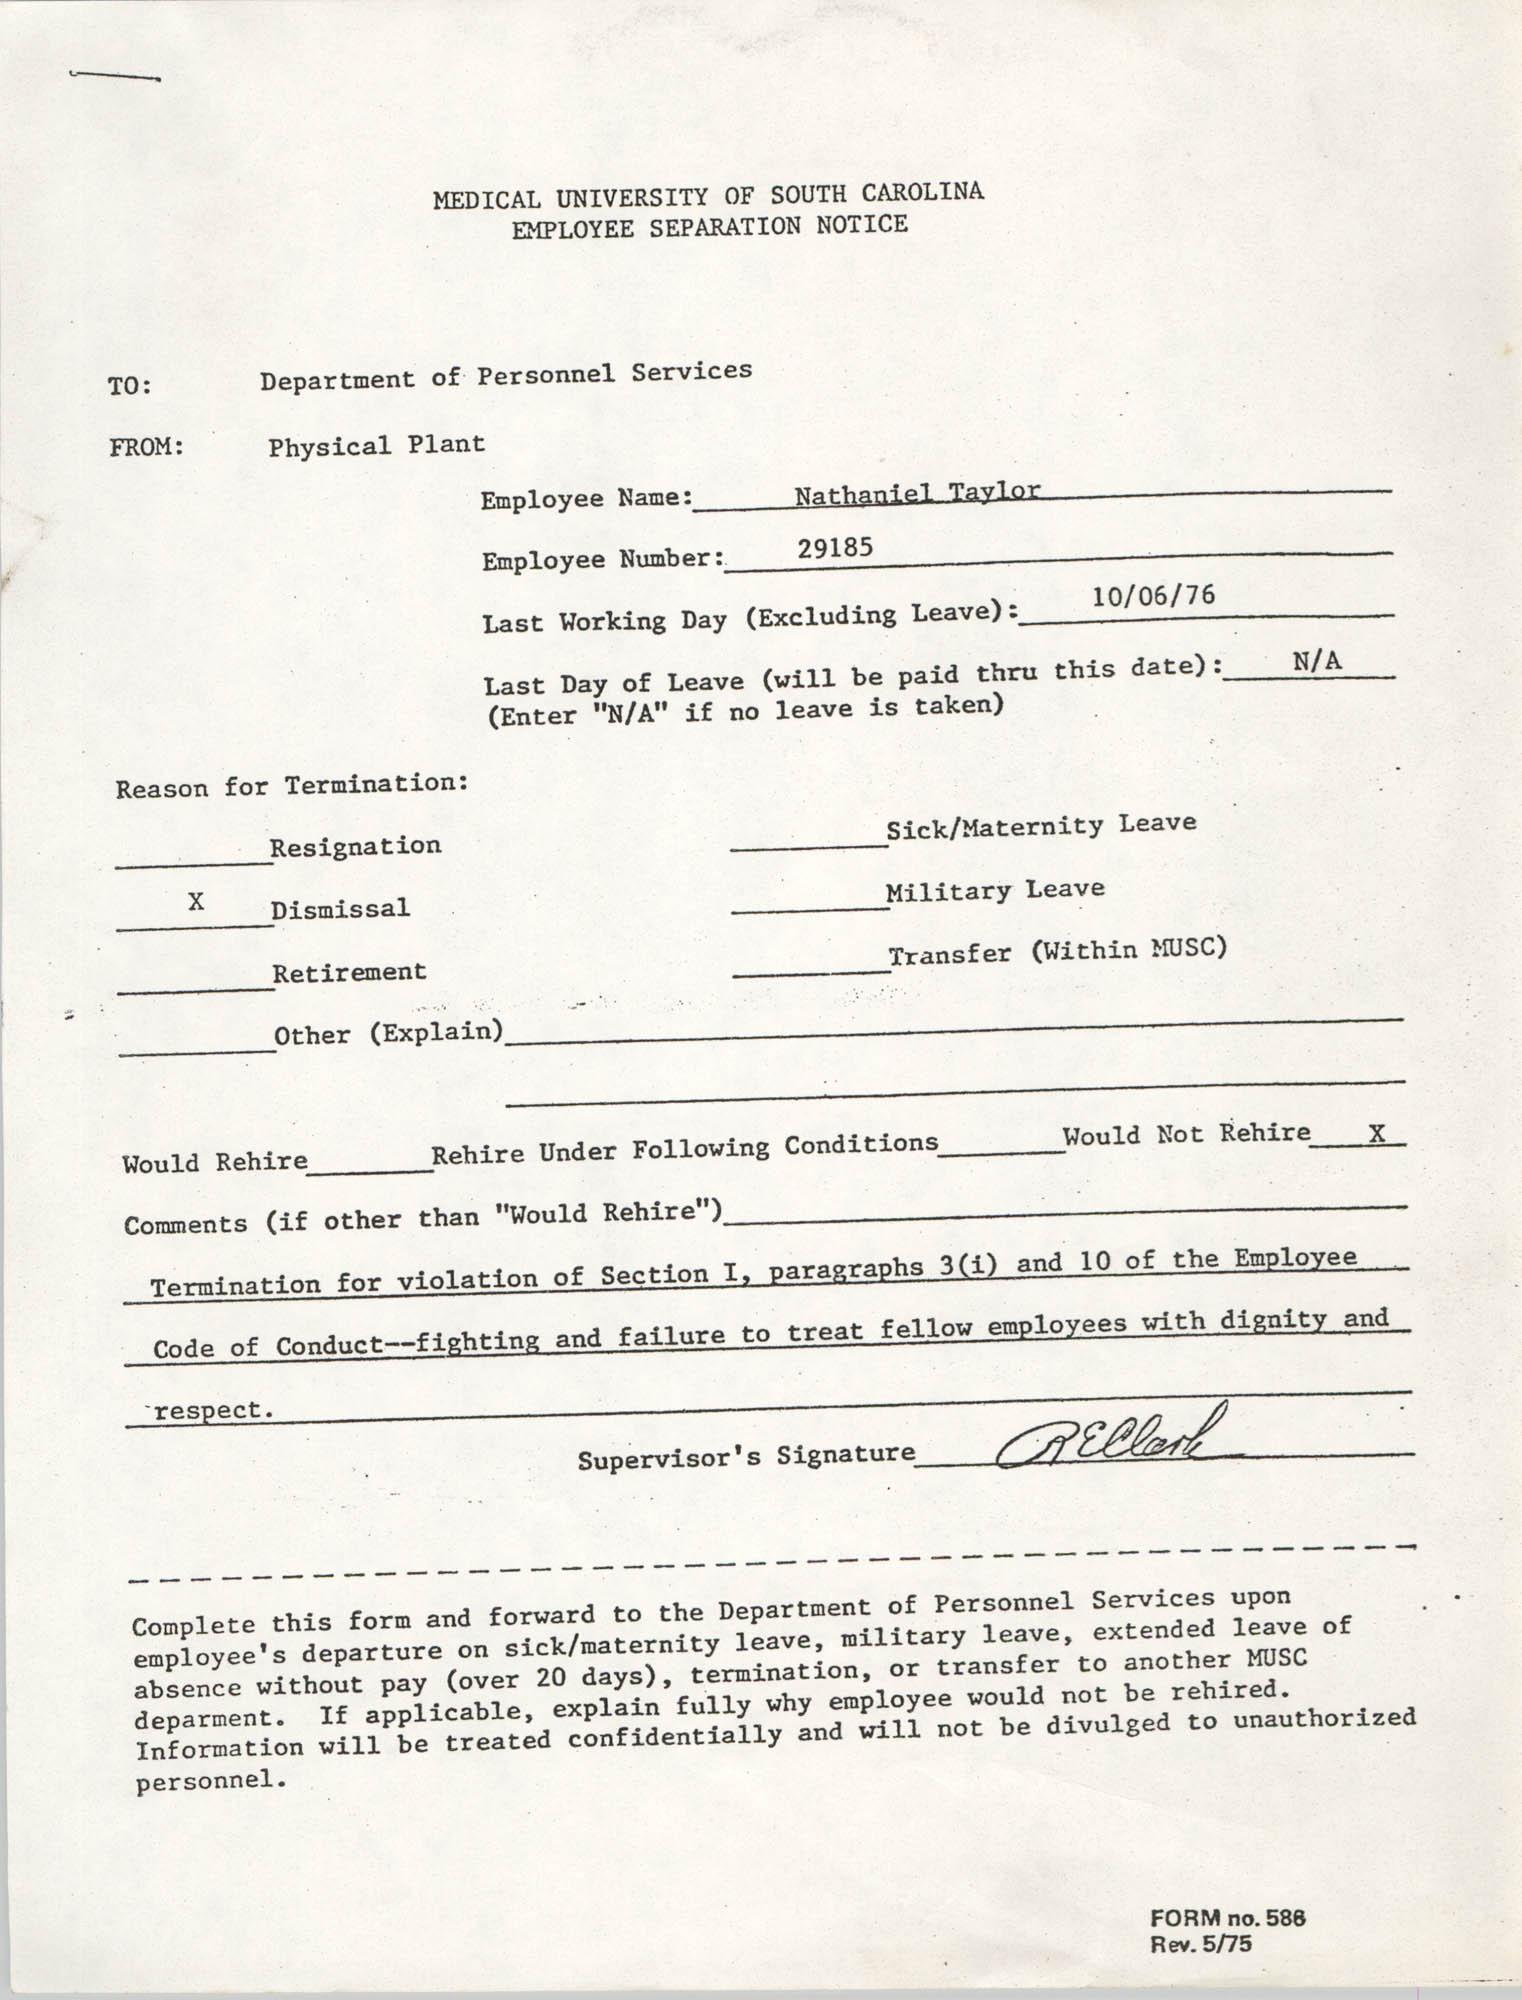 Medical University of South Carolina Employee Separation Notice, Nathaniel Taylor